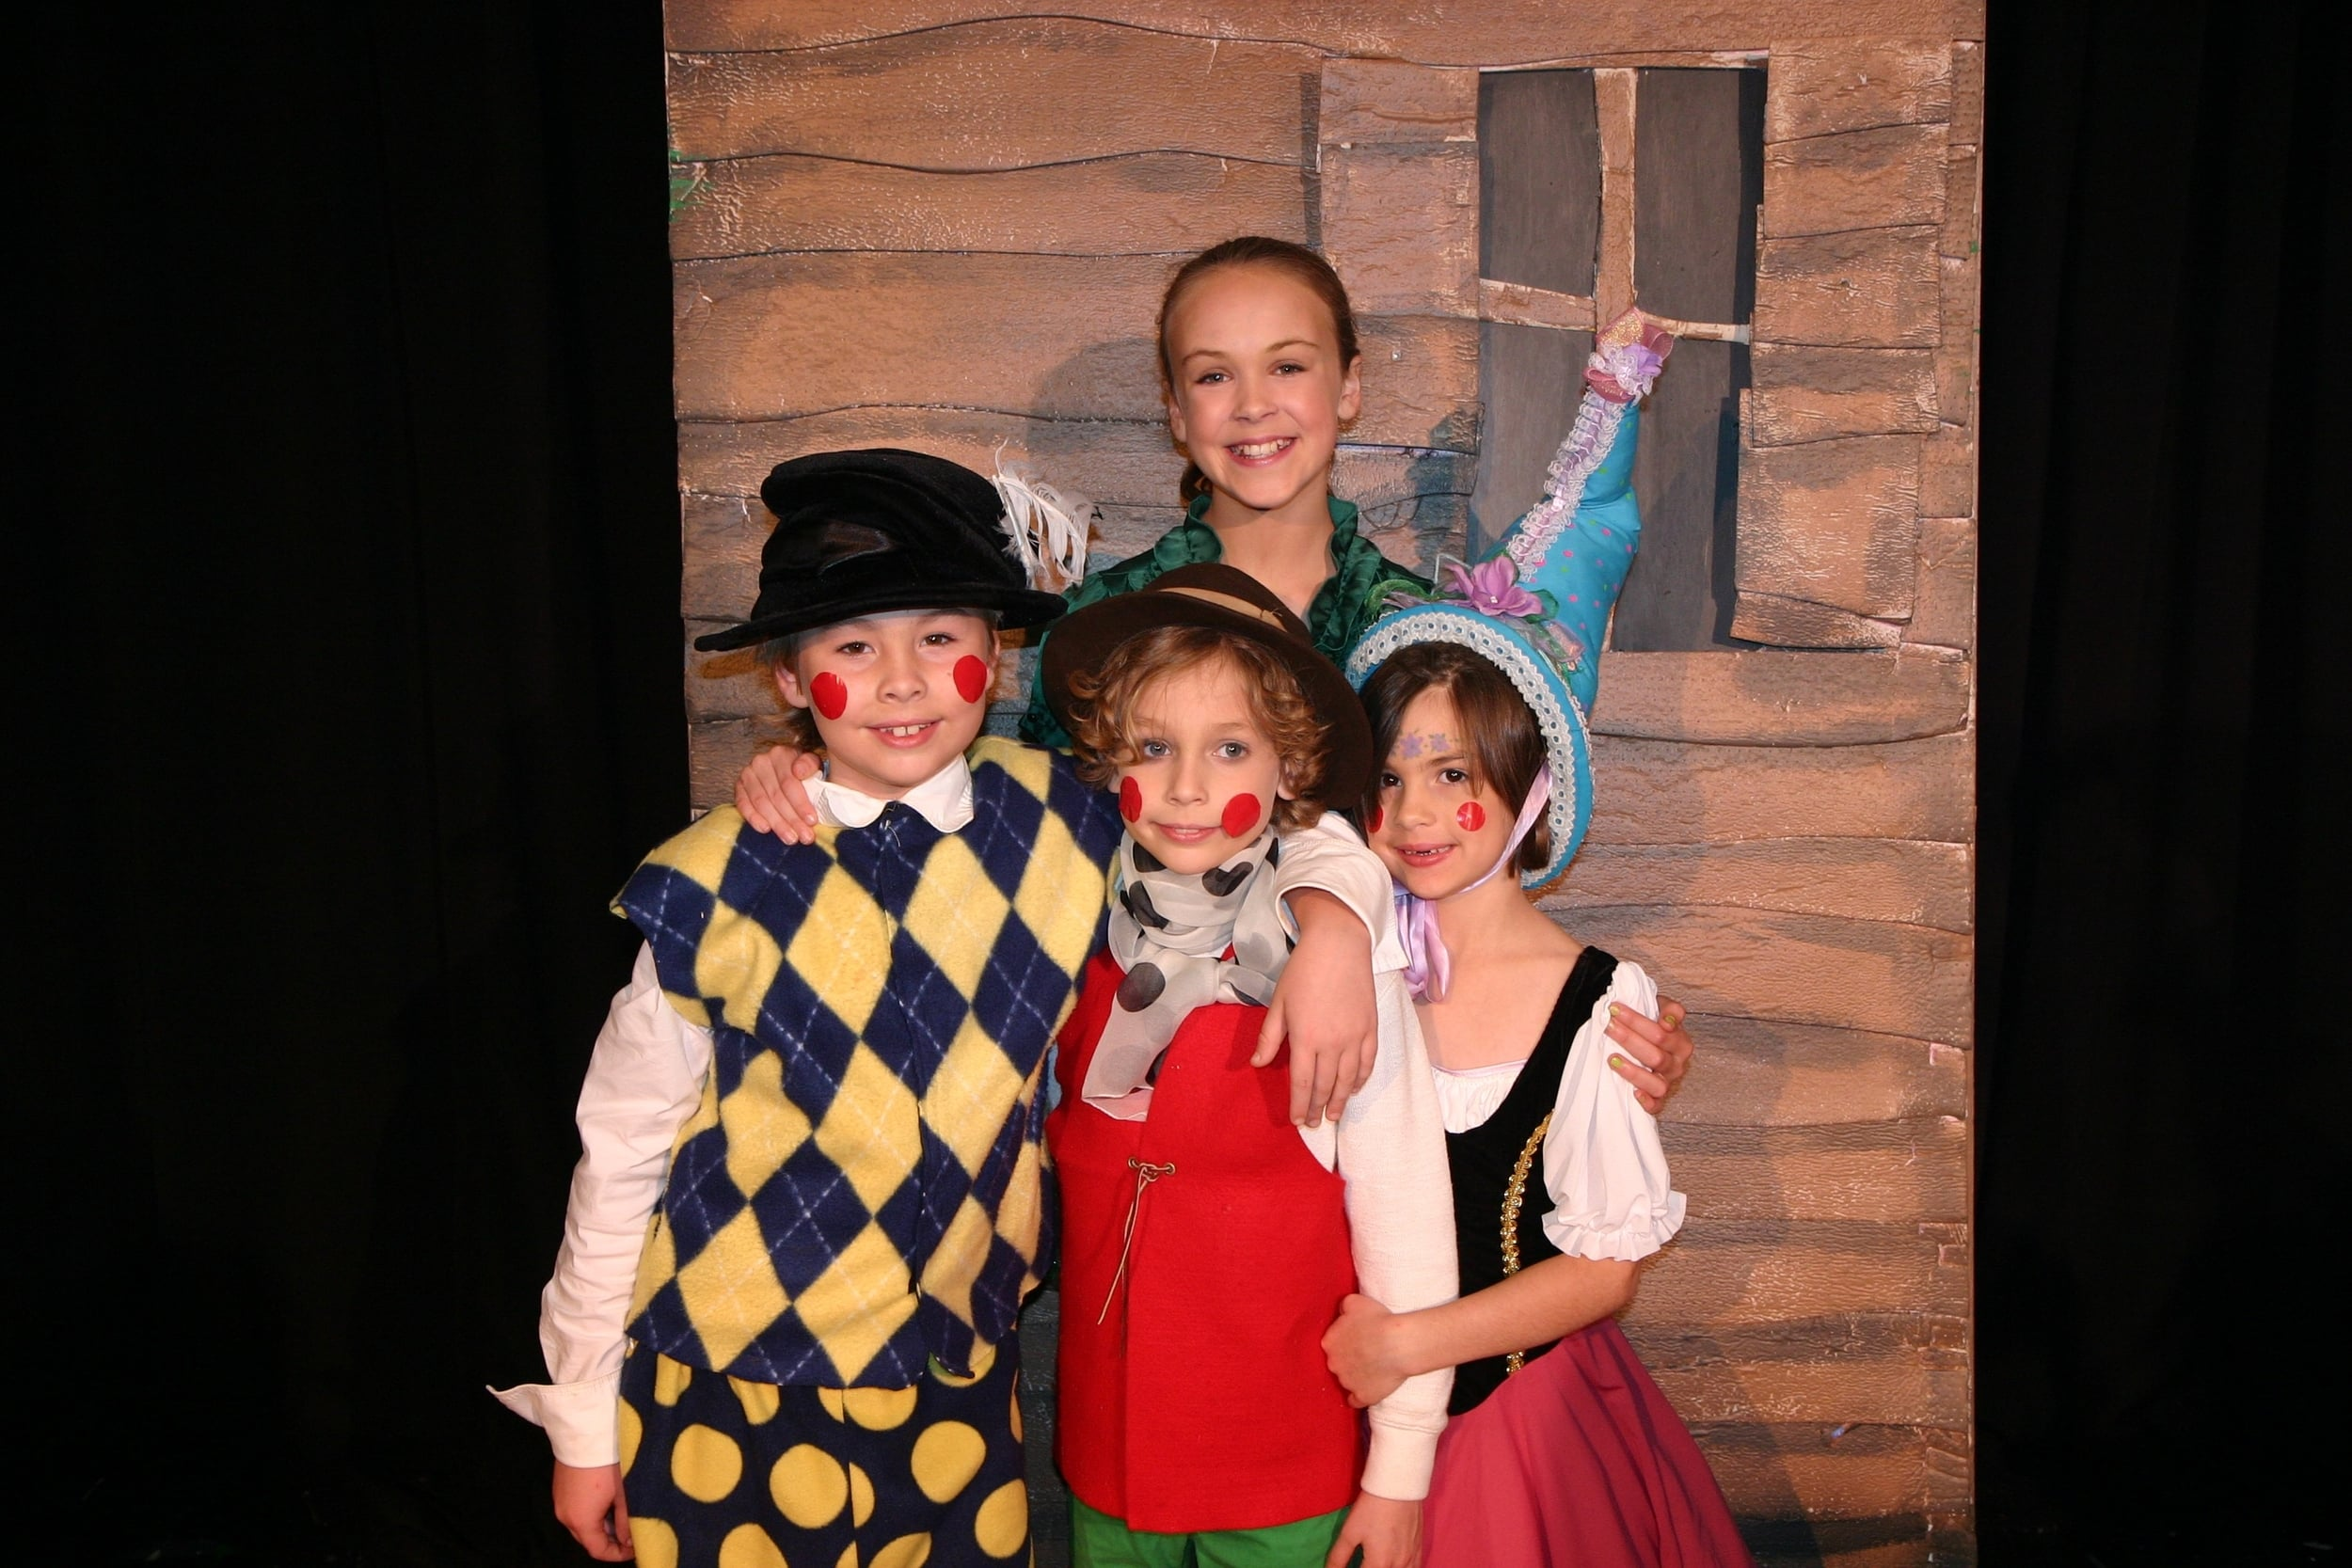 Nathan, Mathias, Etta and Elsa